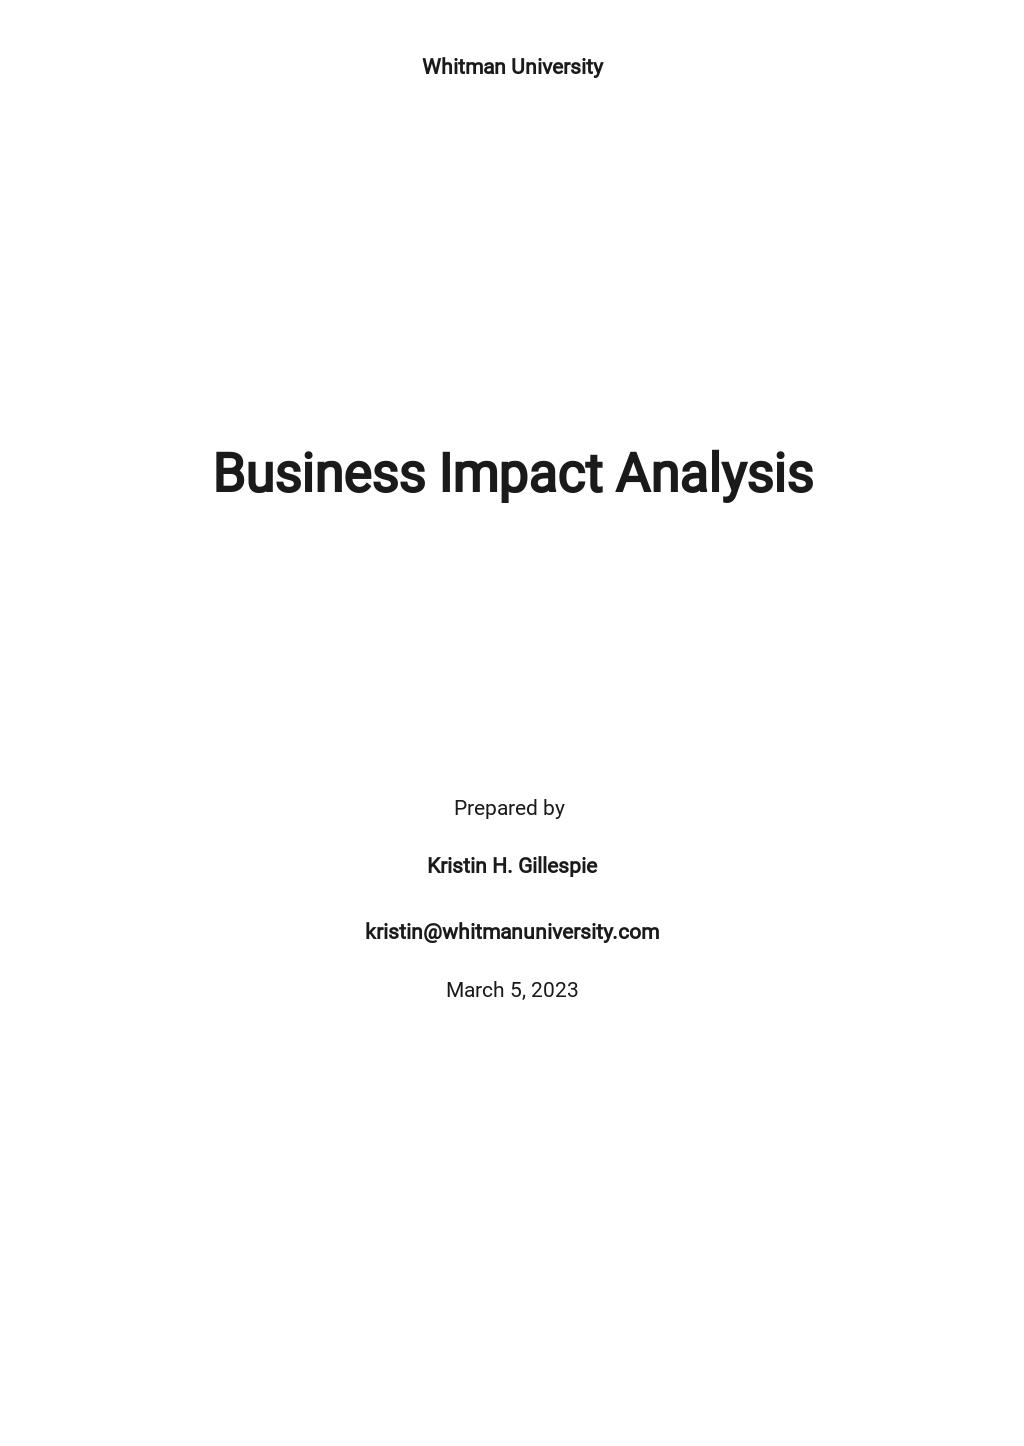 University Business Impact Analysis Template